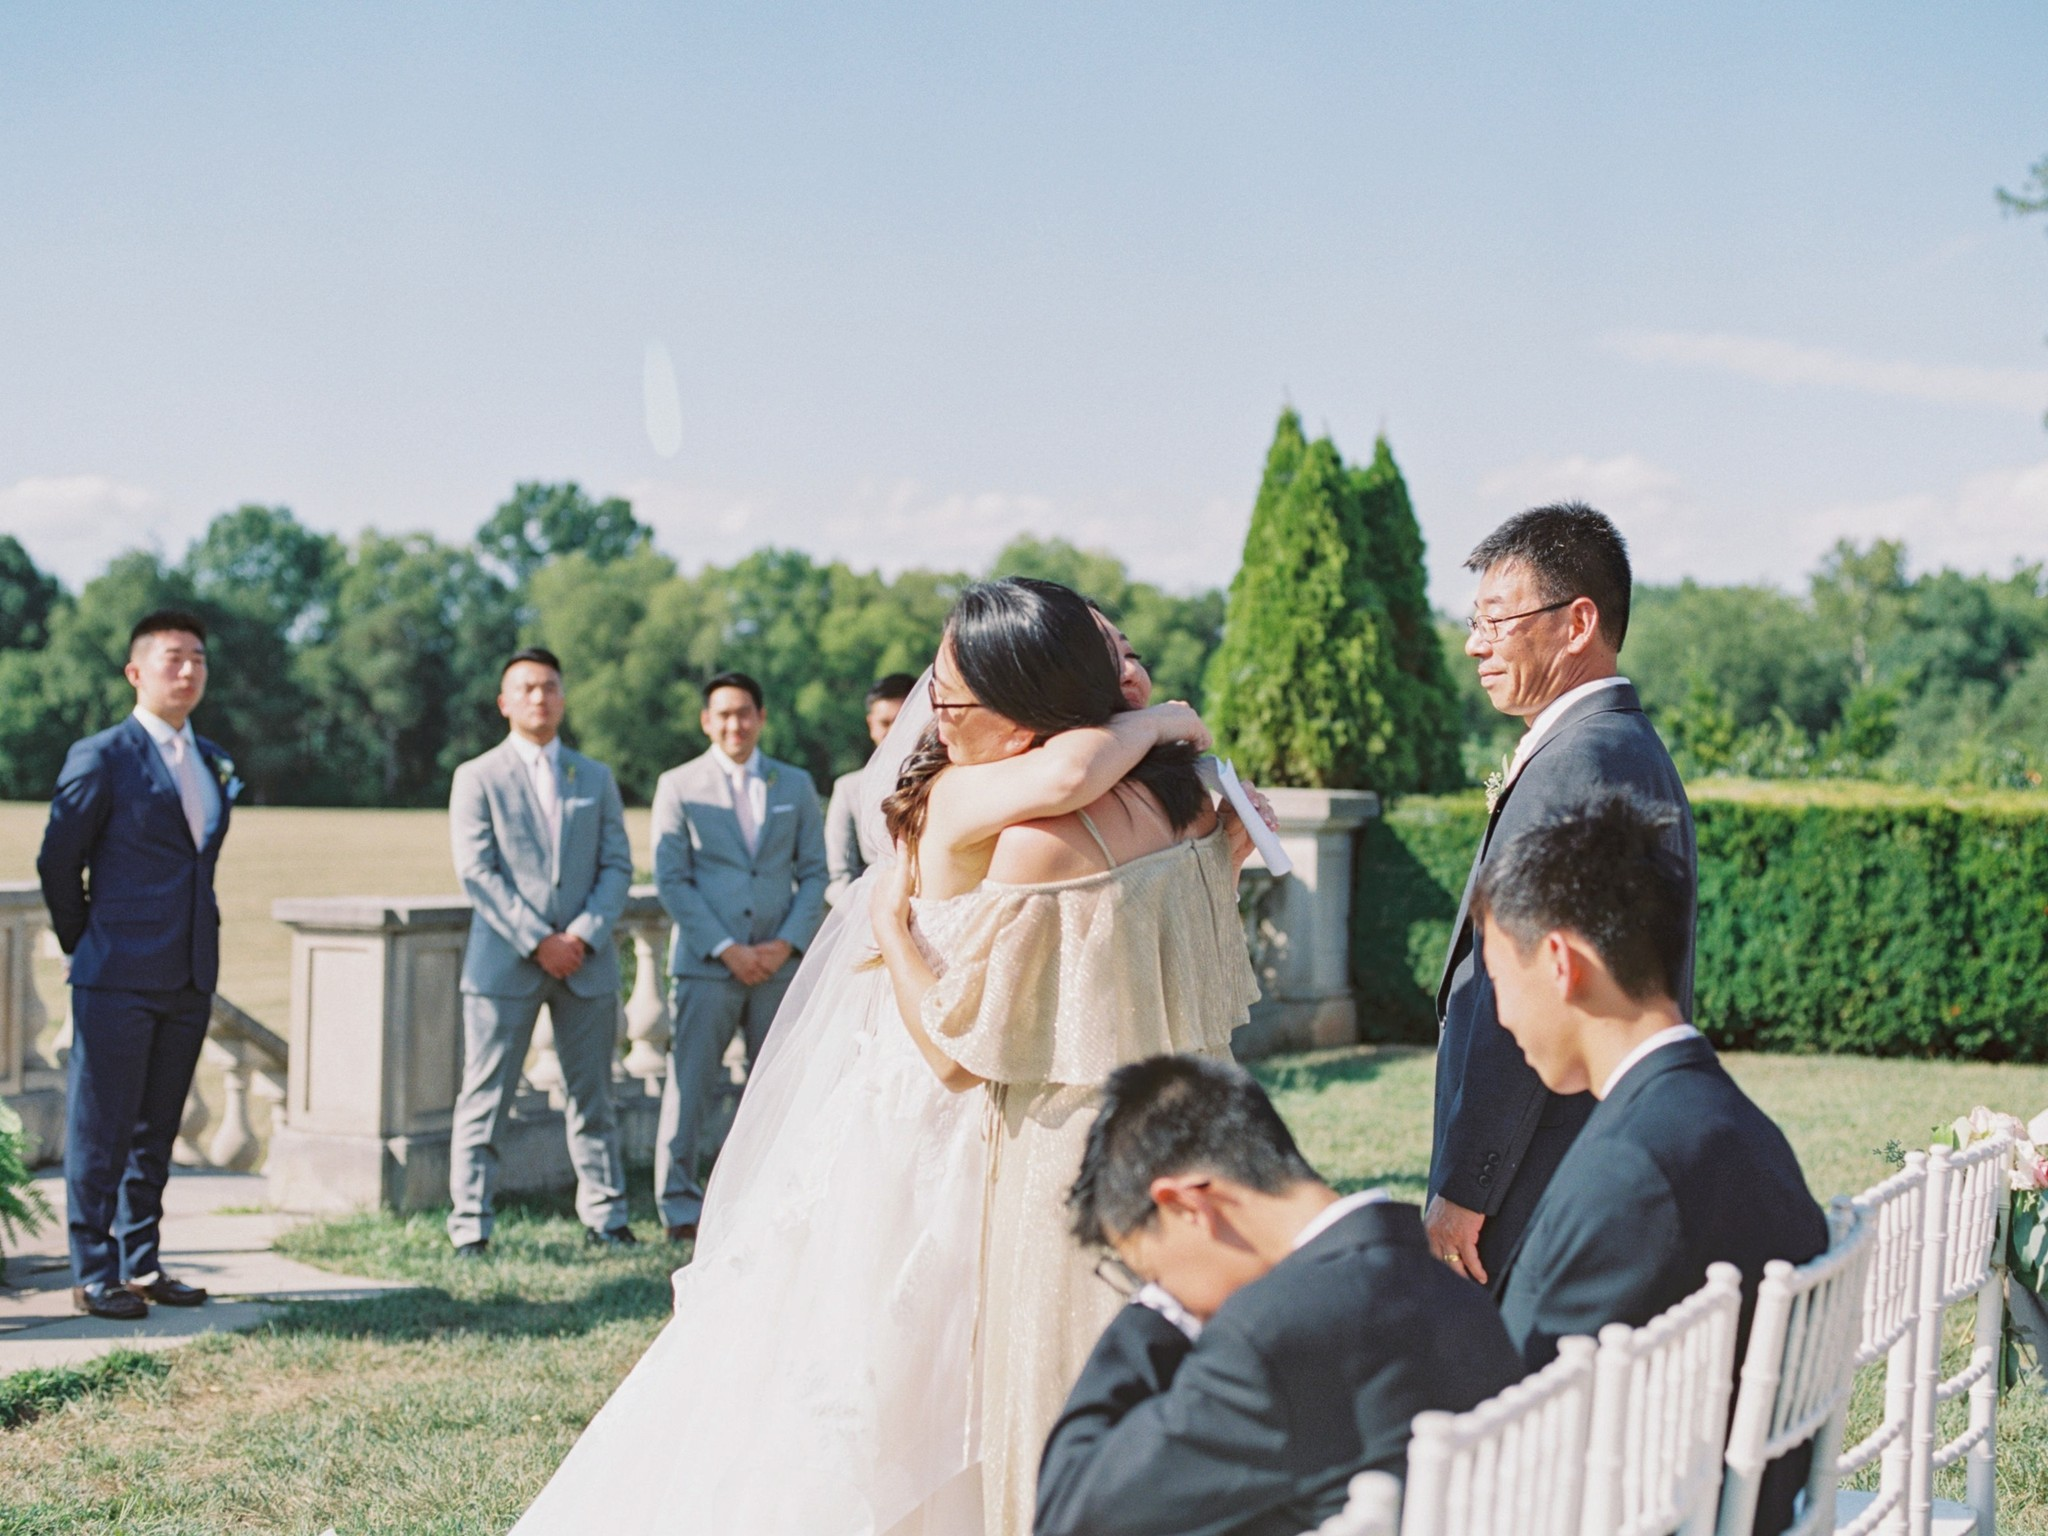 VA-Great-Marsh-Estate-Summer-Wedding-Blush-59.jpg